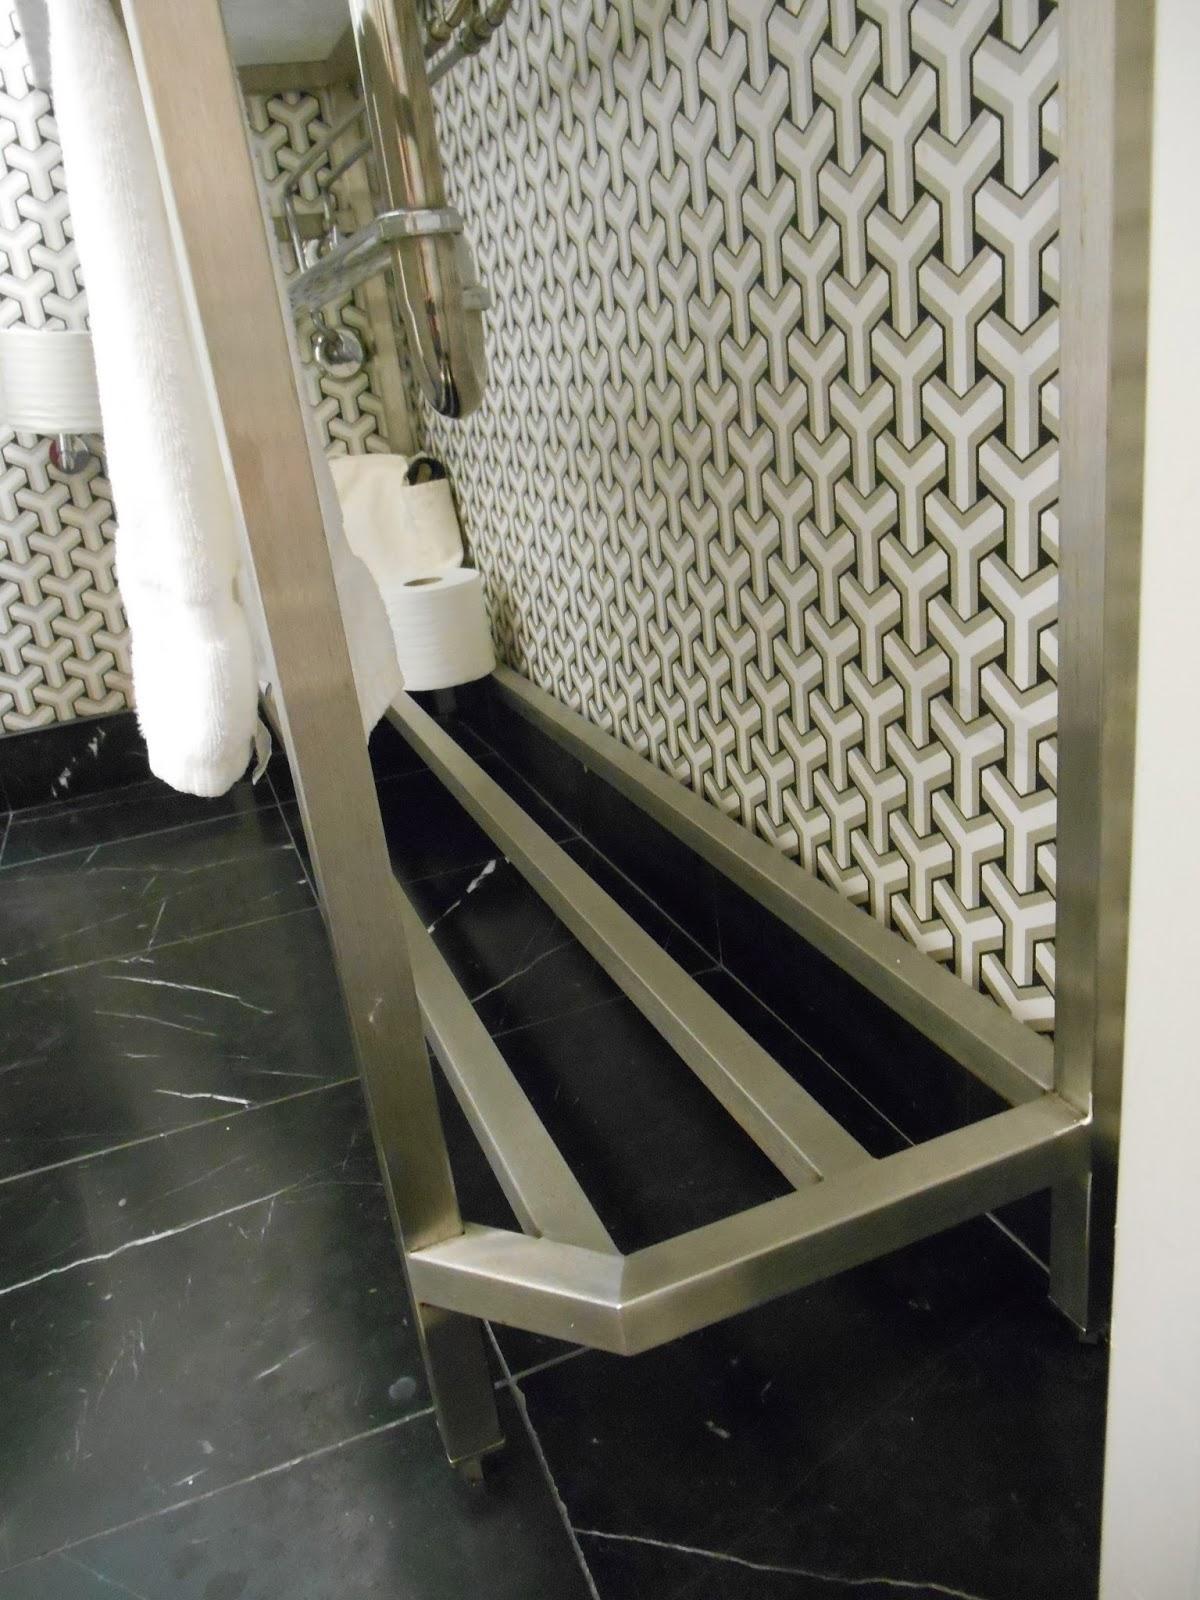 My Notting Hill: A Smart Narrow Bathroom